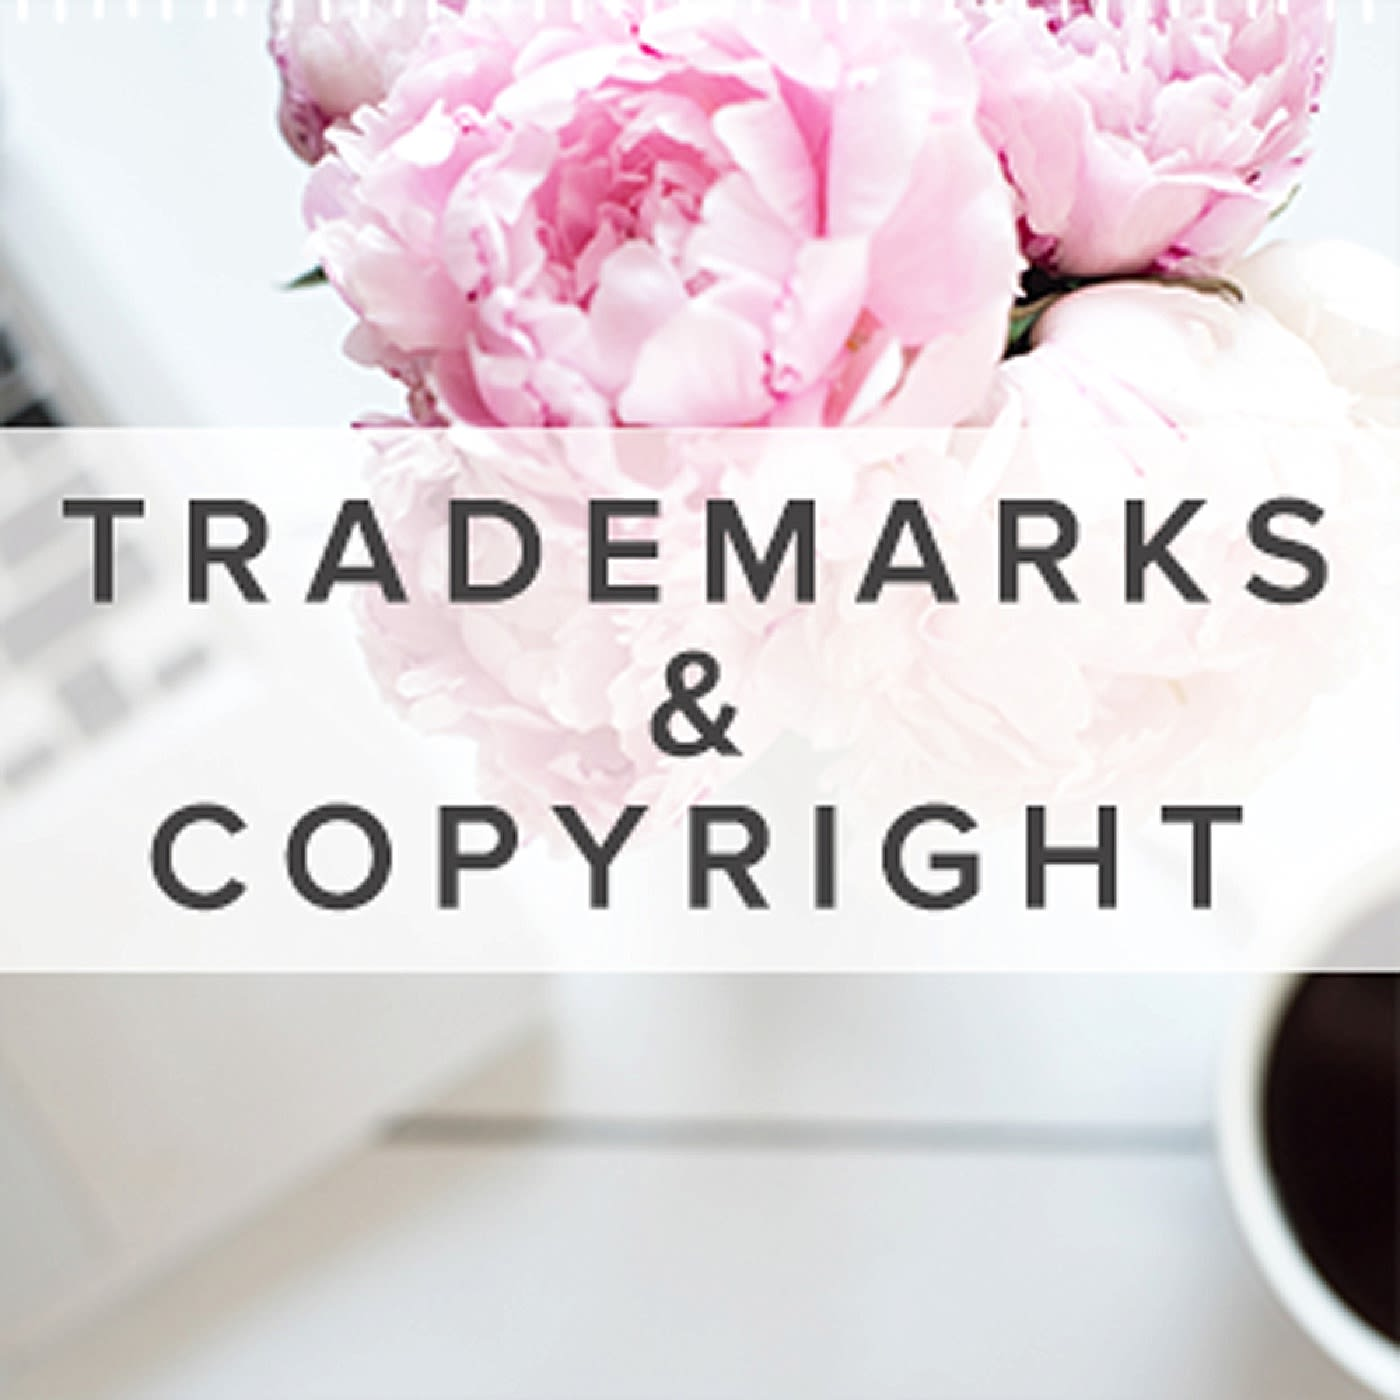 Trademarks & Copyright   via the Rising Tide Society